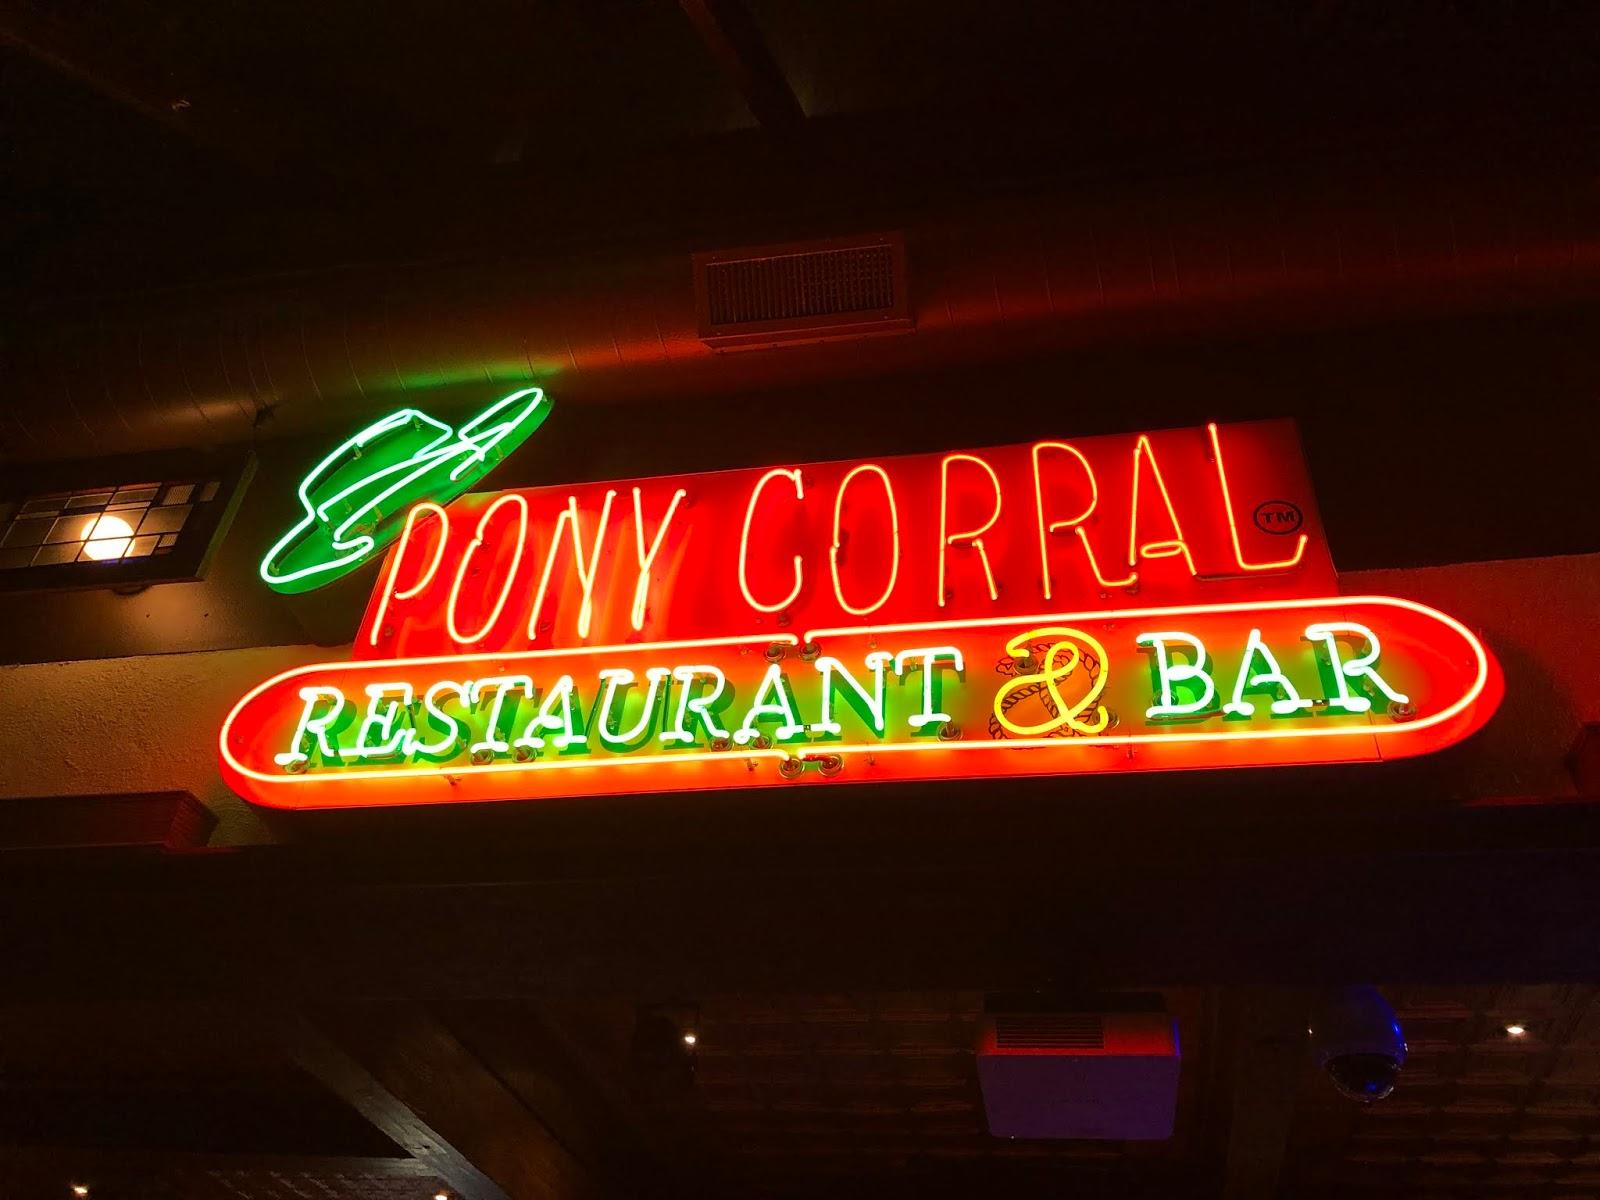 Teena In Toronto Pony Corral Restaurant Bar Downtown Winnipeg Mb